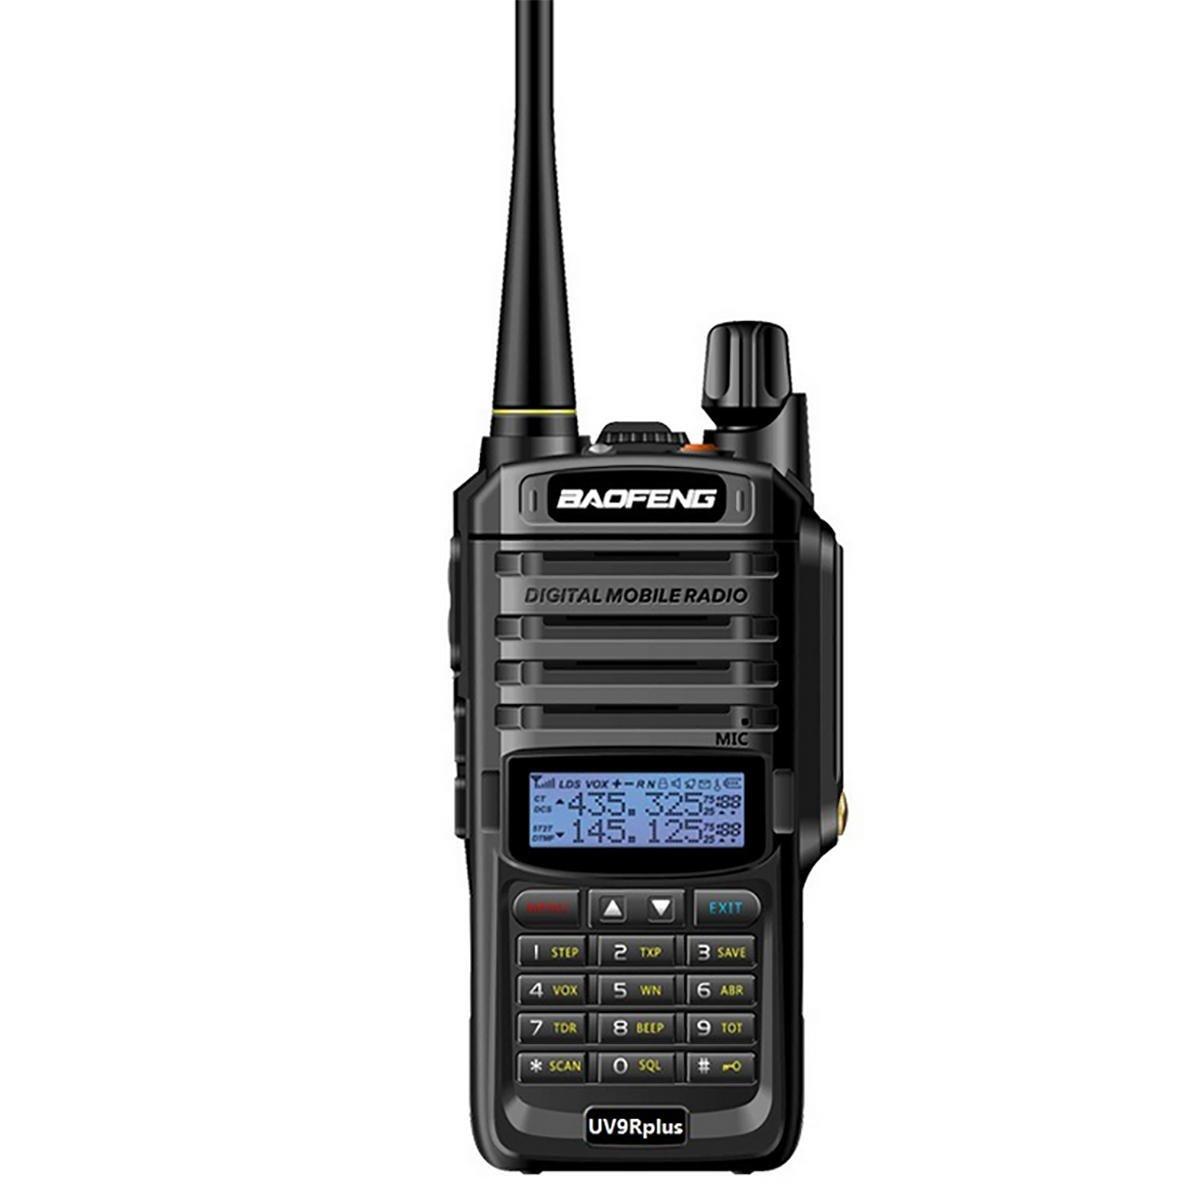 Baofeng UV-9R Plus 8W VHF UHF Walkie Talkie versione aggiornata